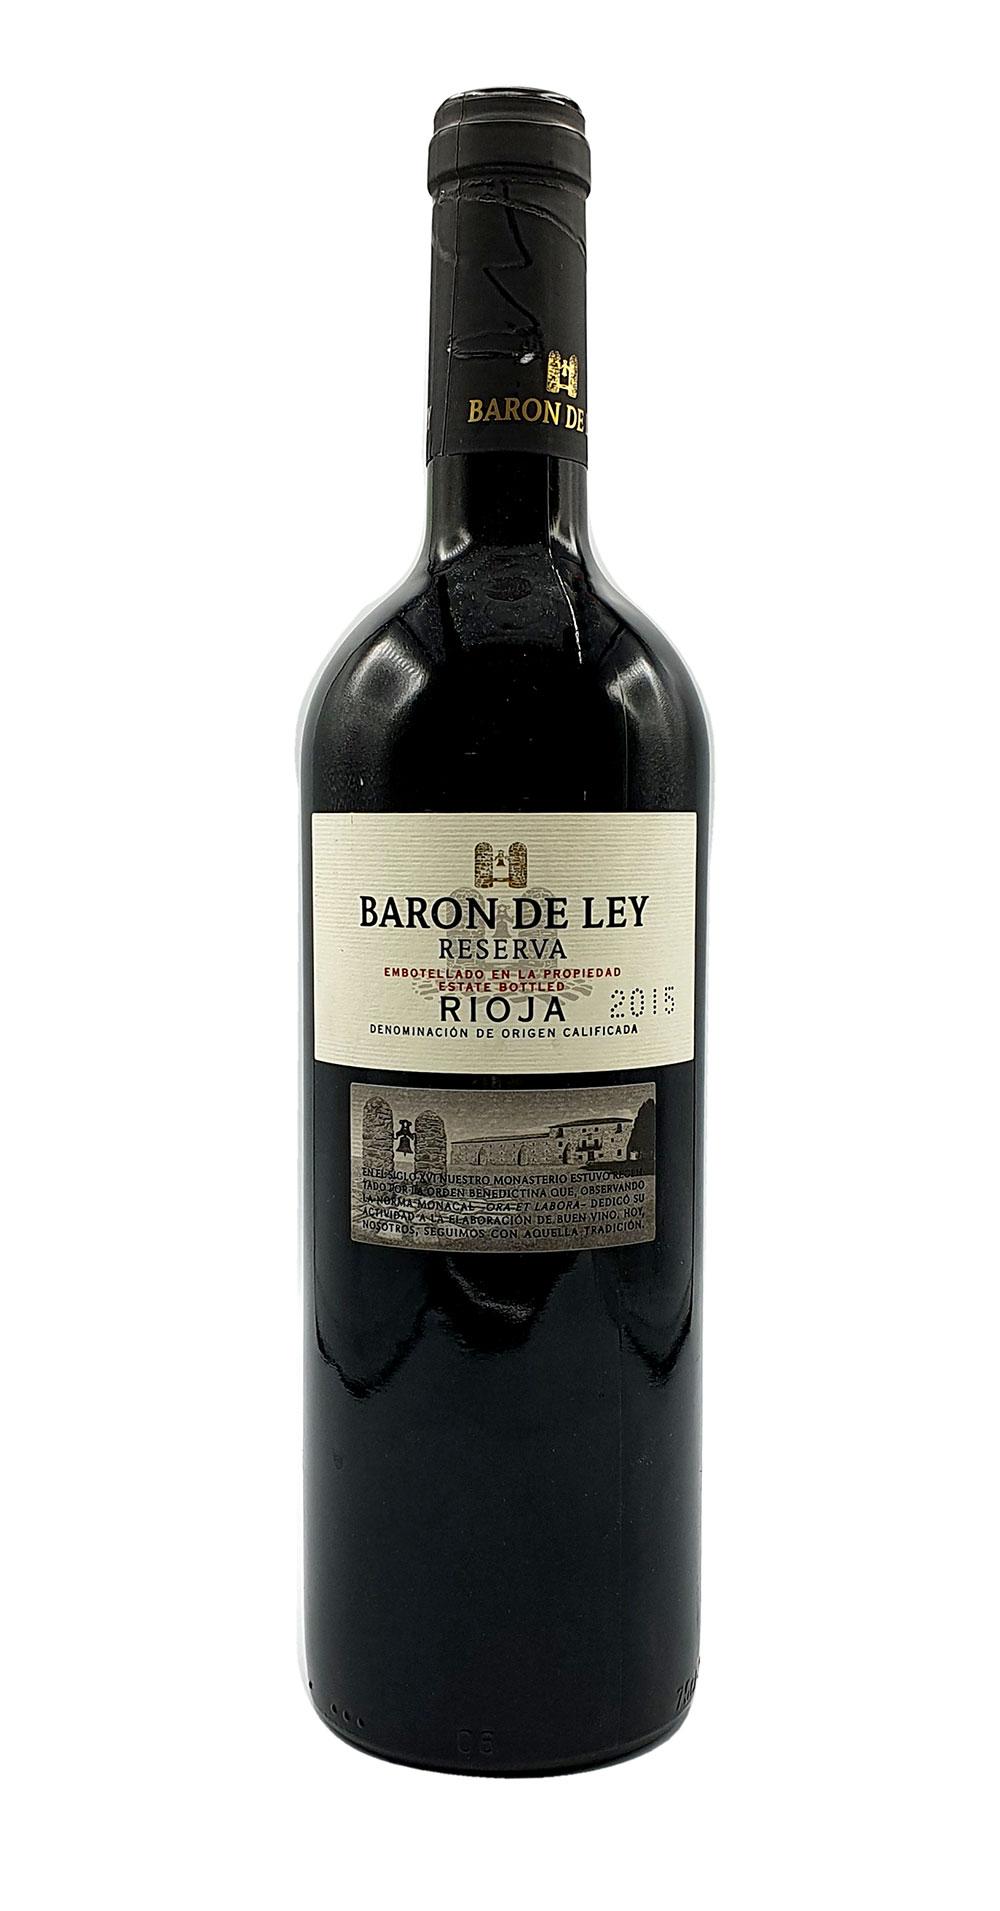 Baron de Ley Rotwein 0,75L (14% Vol) - Reserva Rioja - Spanien- [Enthält Sulfite]